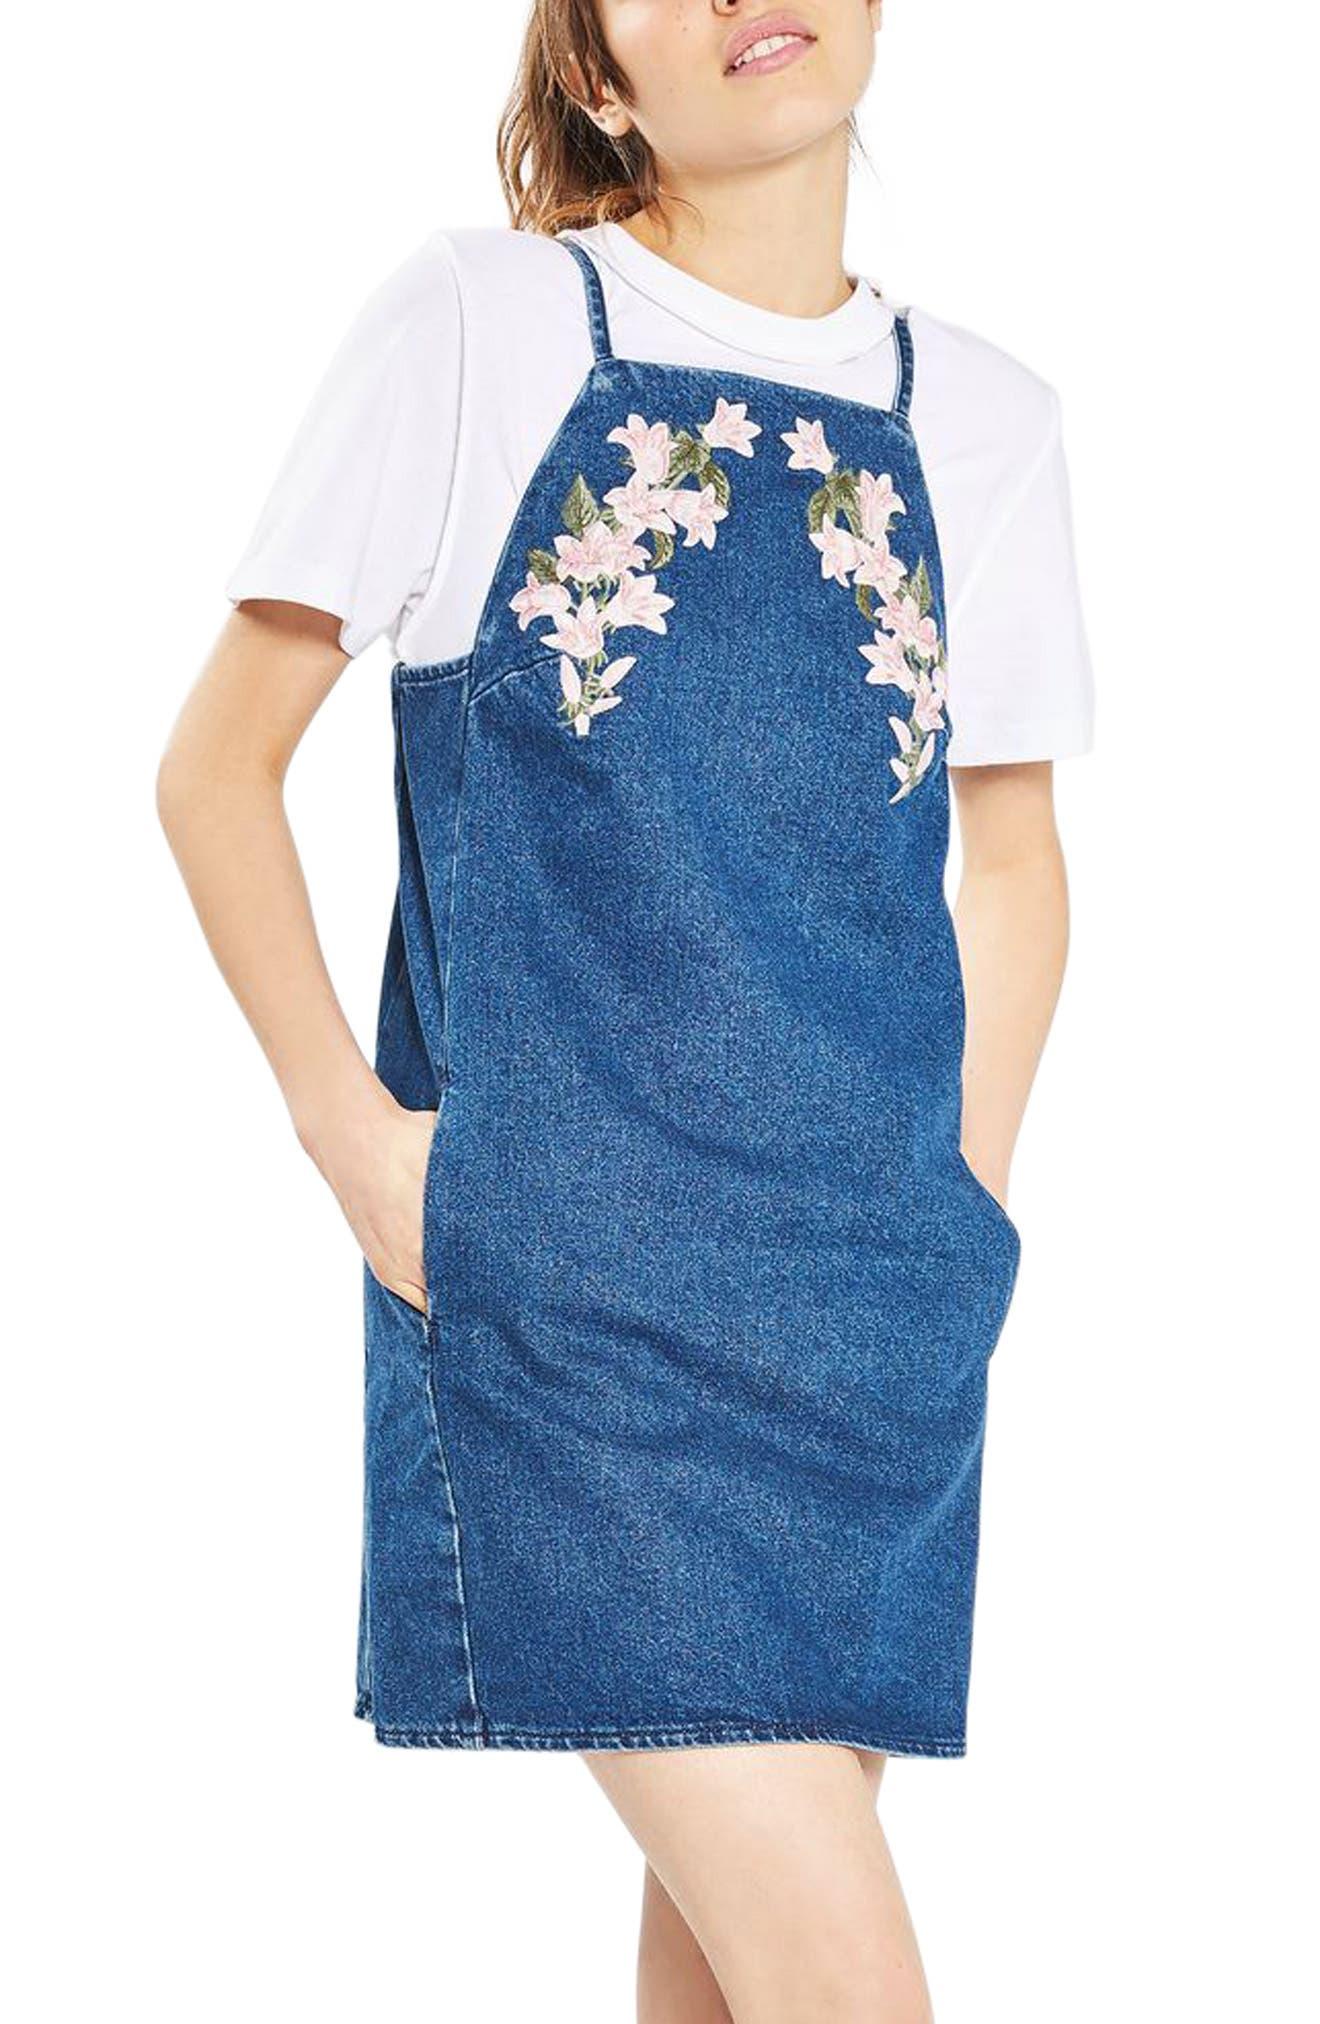 Main Image - Topshop Tulip Embroidered Pinafore Dress